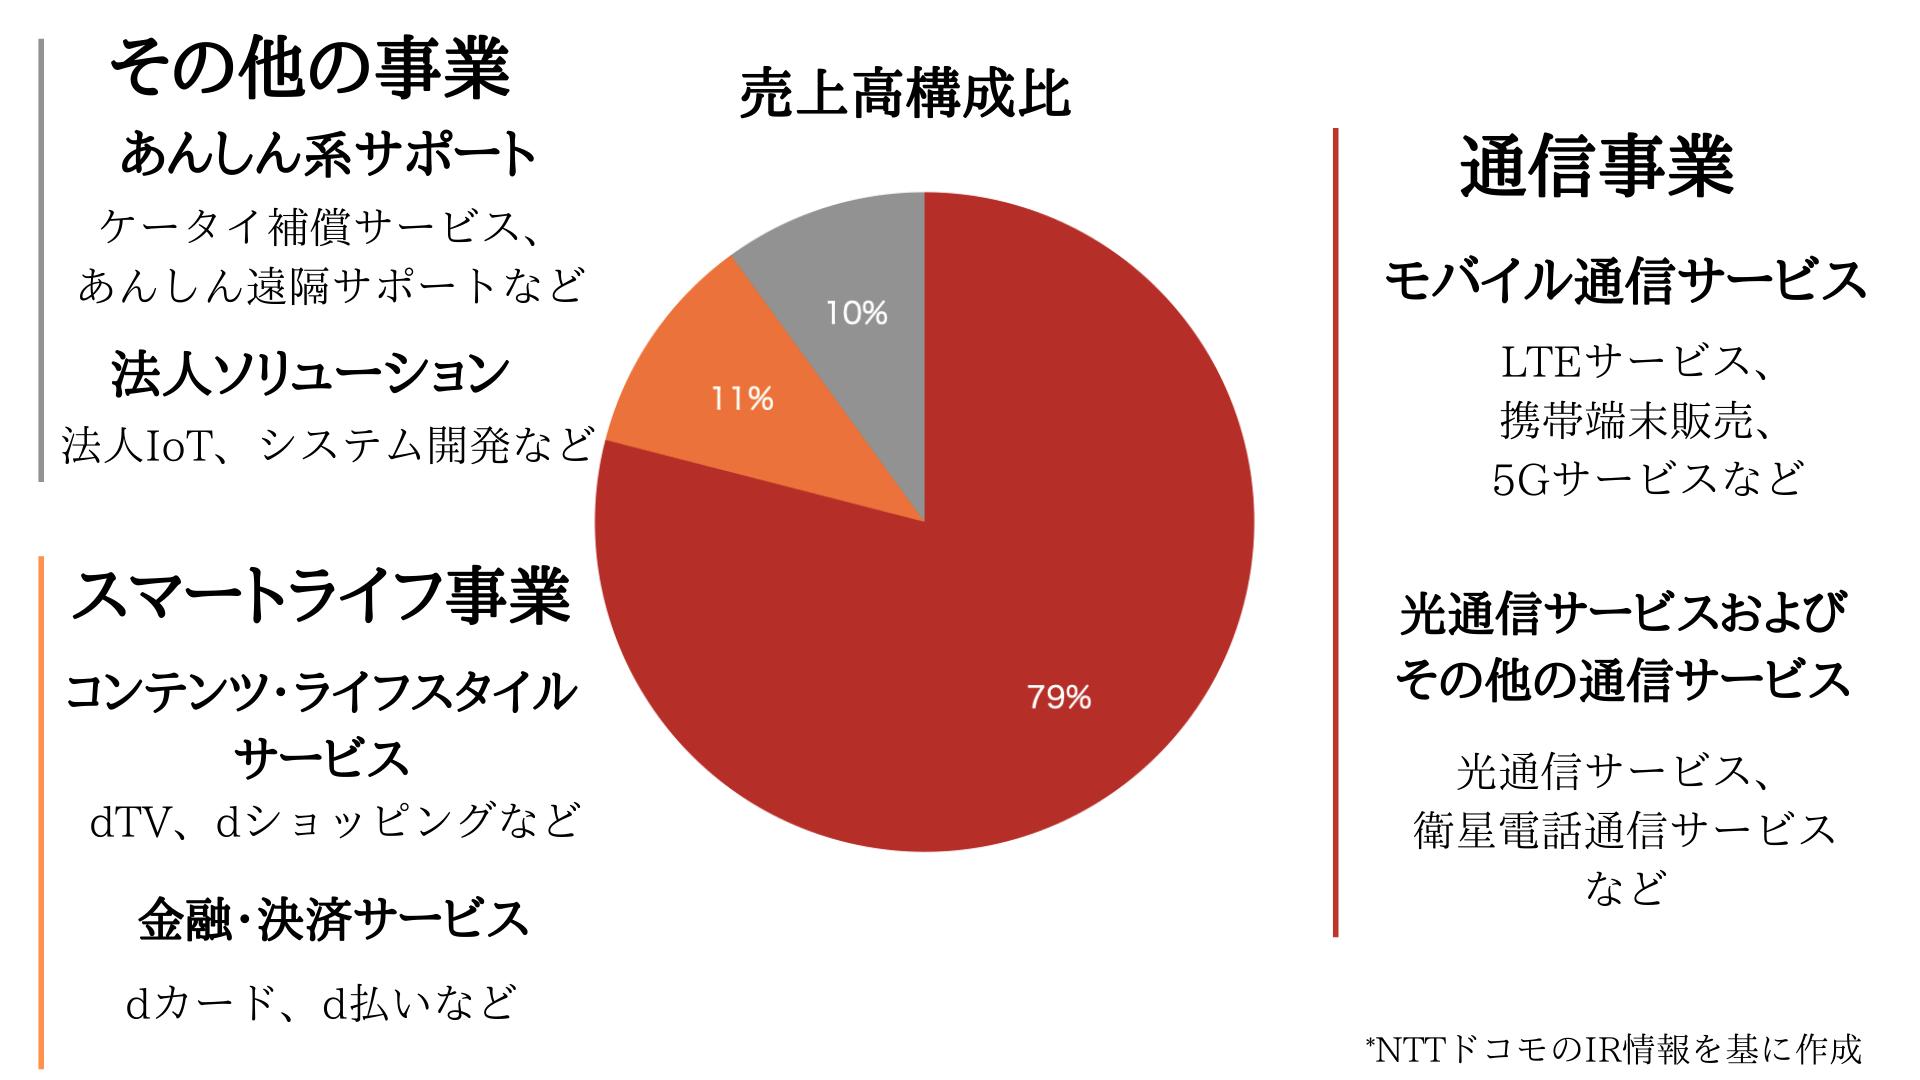 NTTドコモの事業